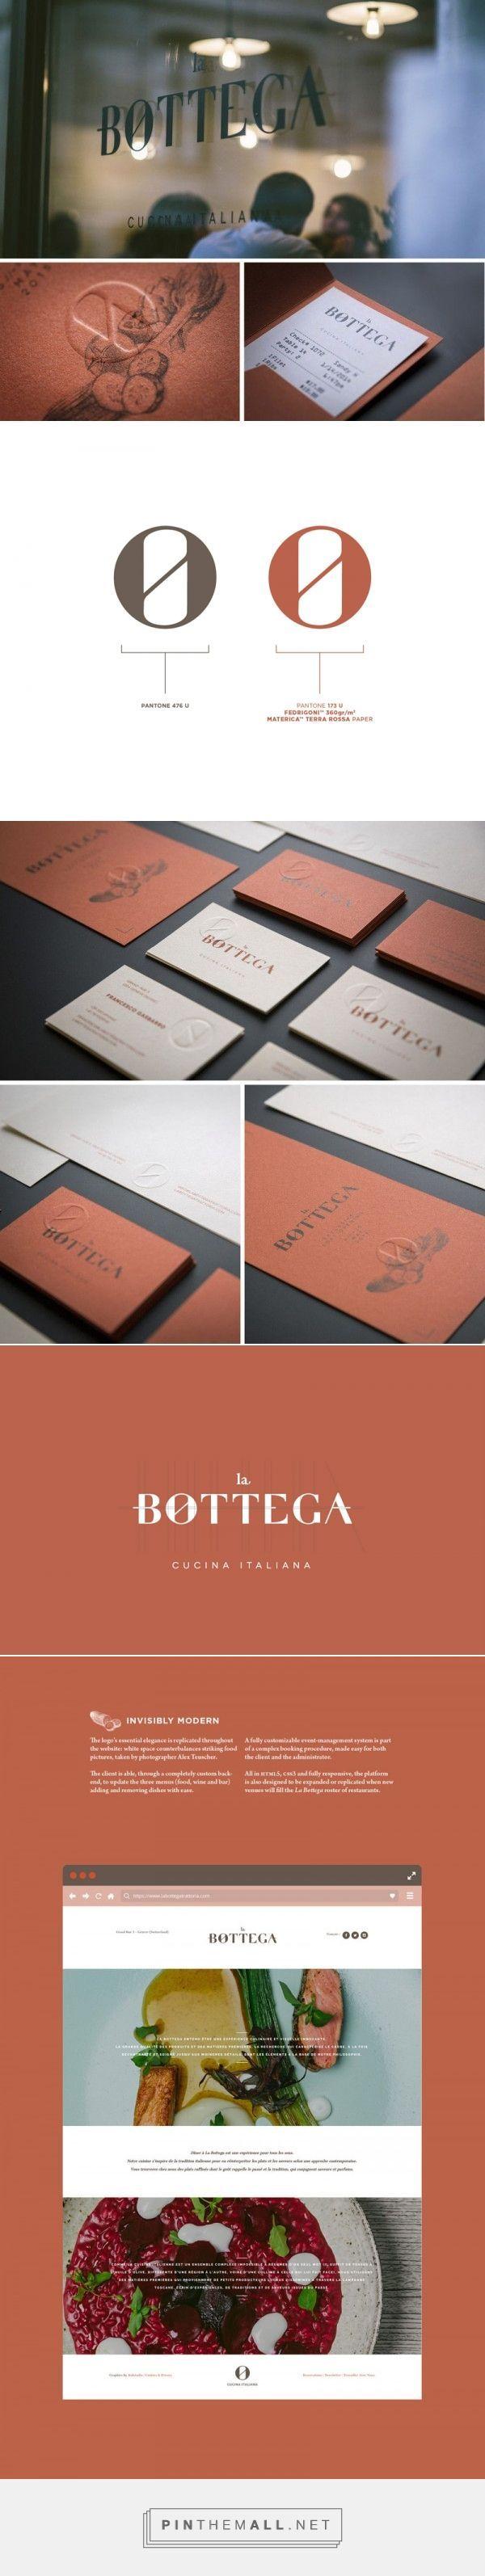 La Bottega Restaurant Branding